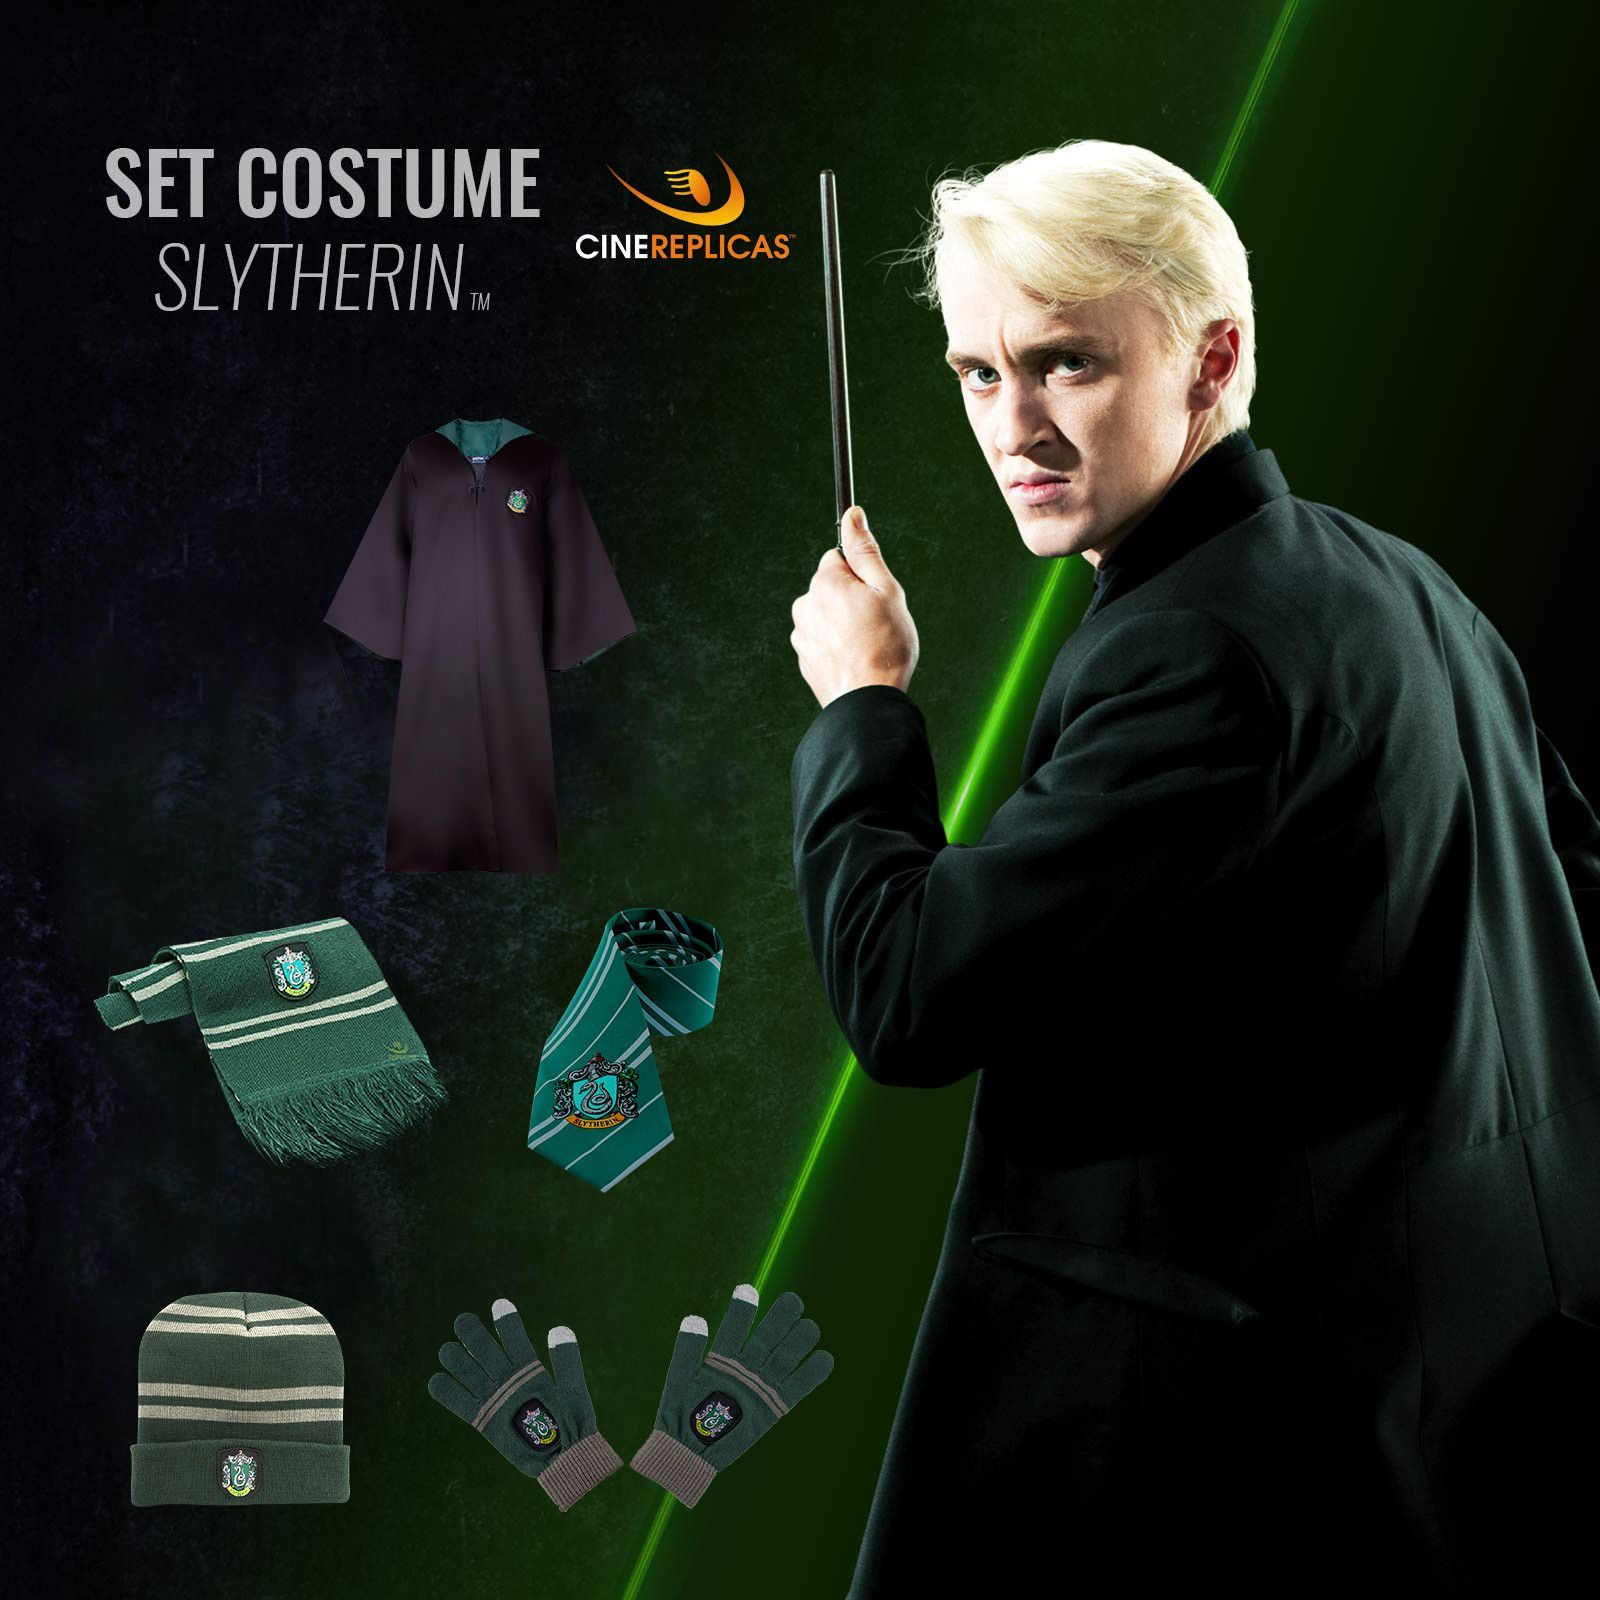 Slytherin Full Uniform Slytherin Hogwarts Uniform Uniform